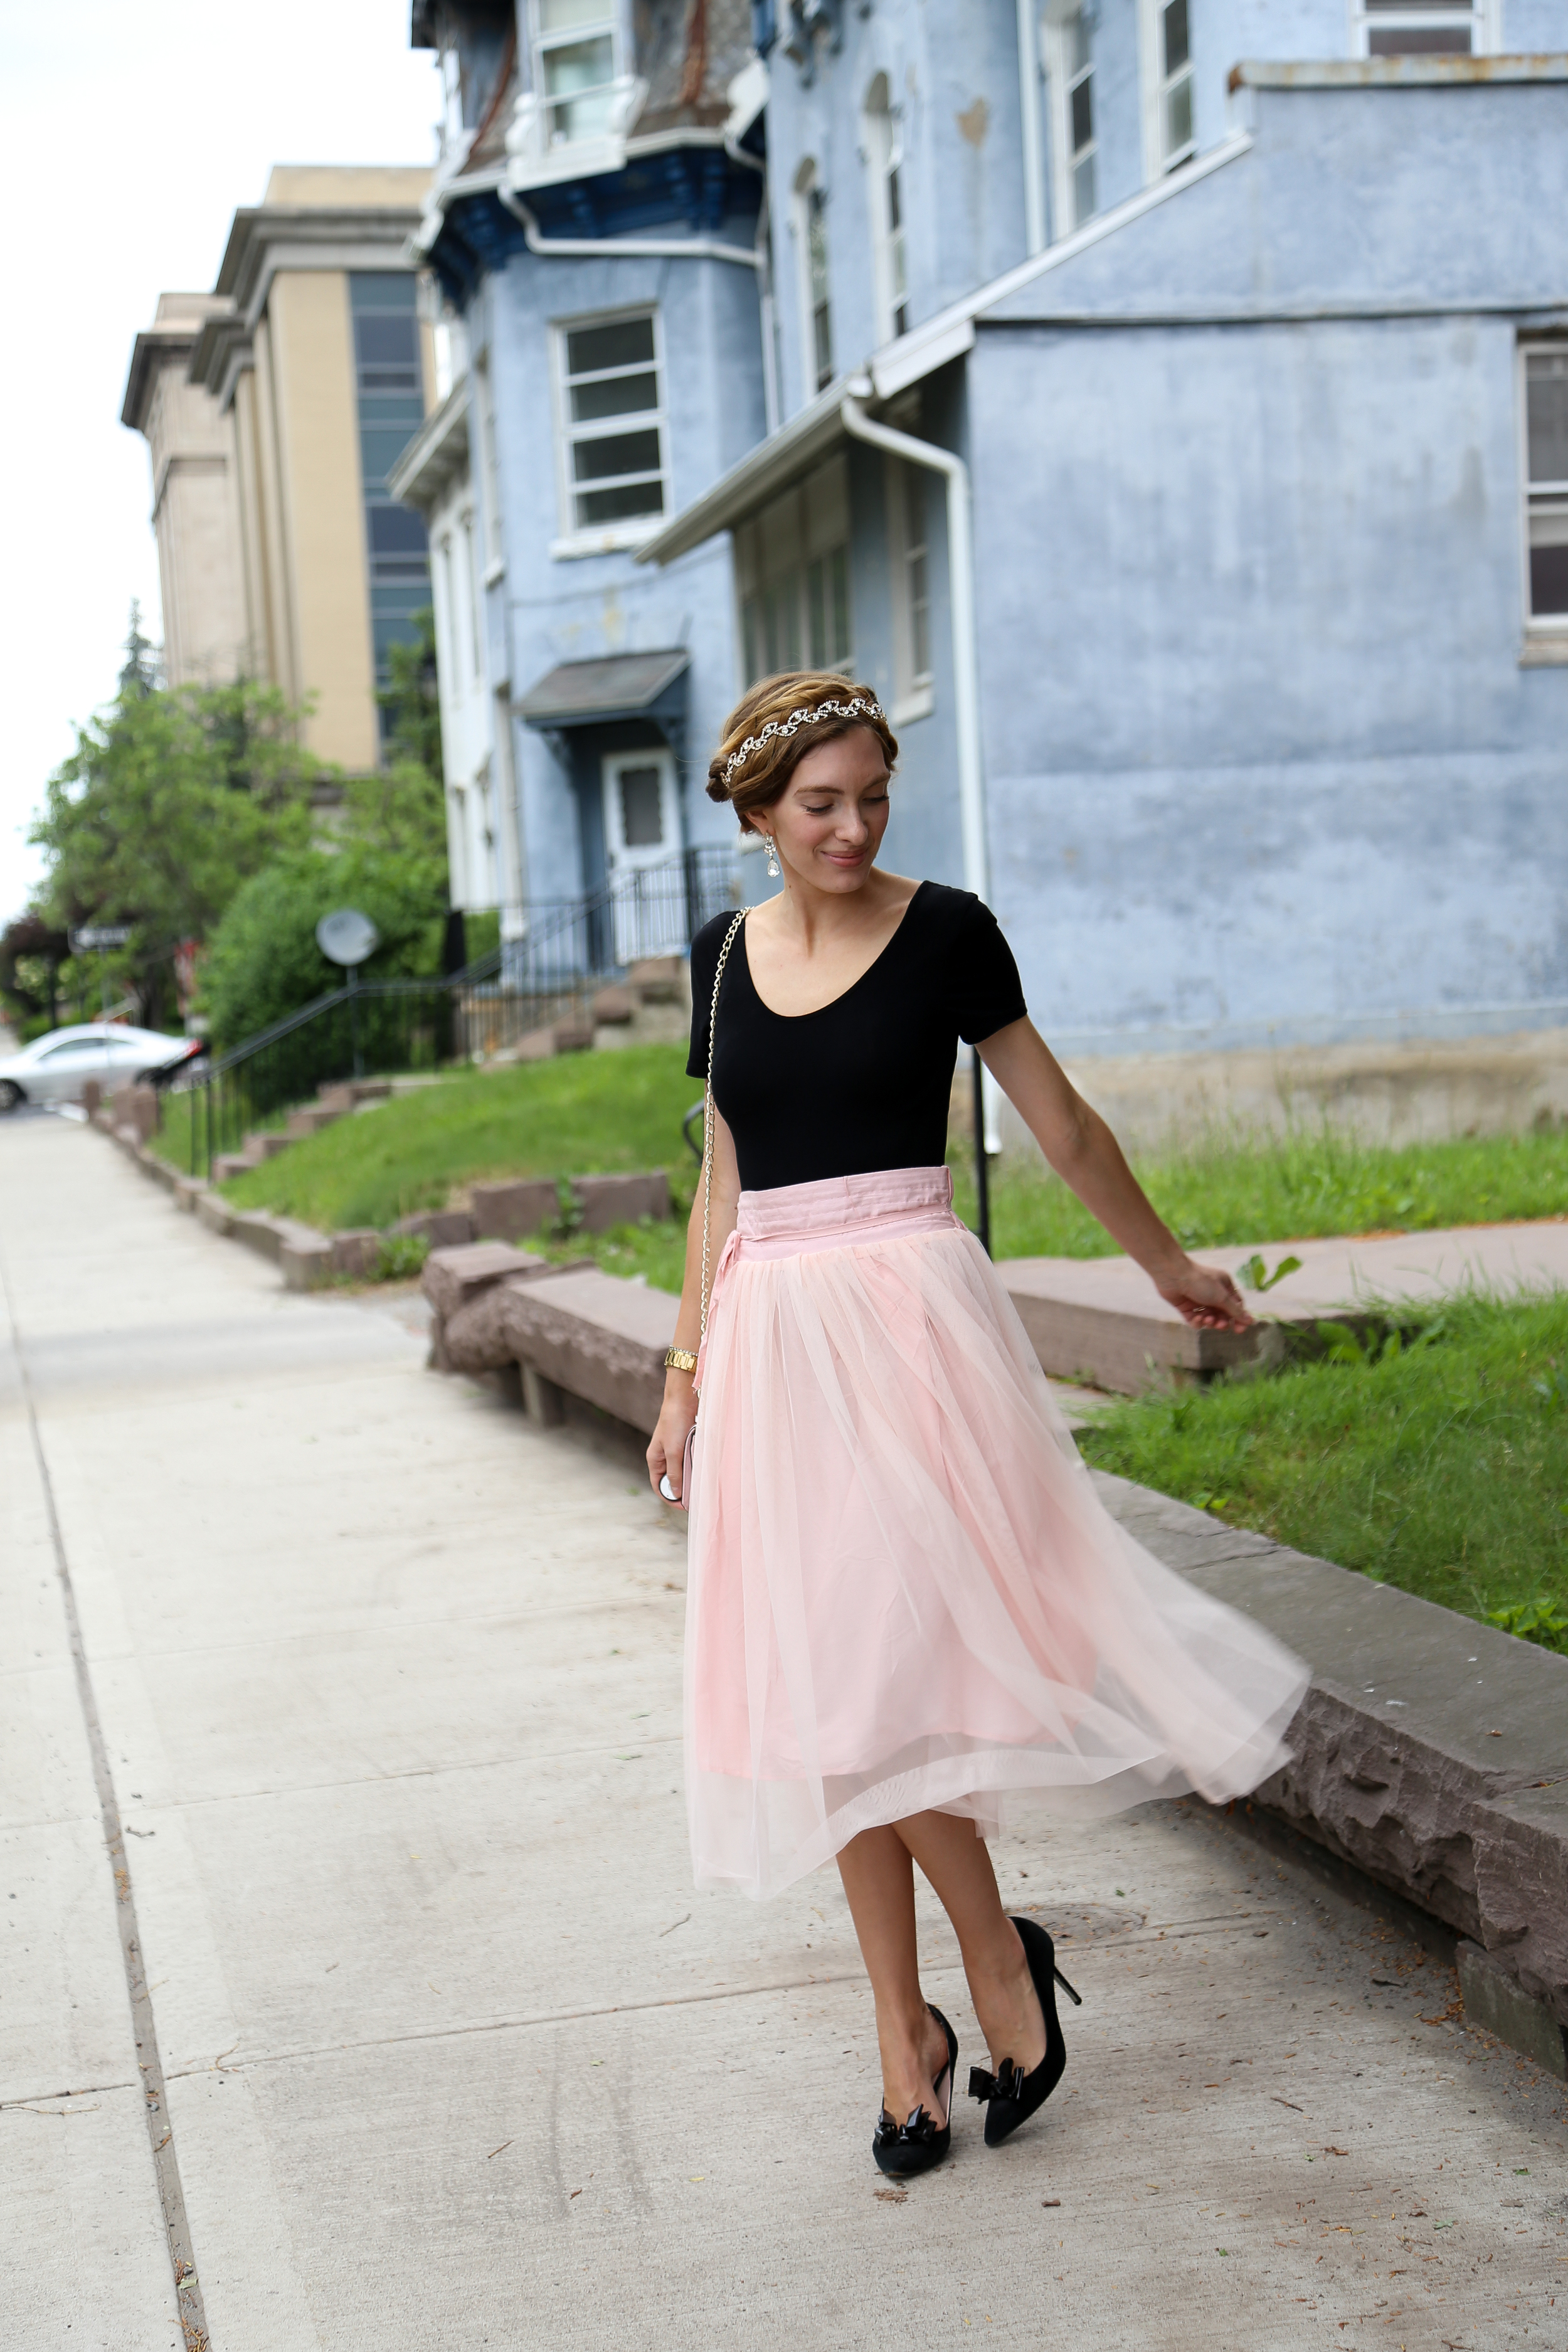 Ballerina in the City- Enchanting Elegance